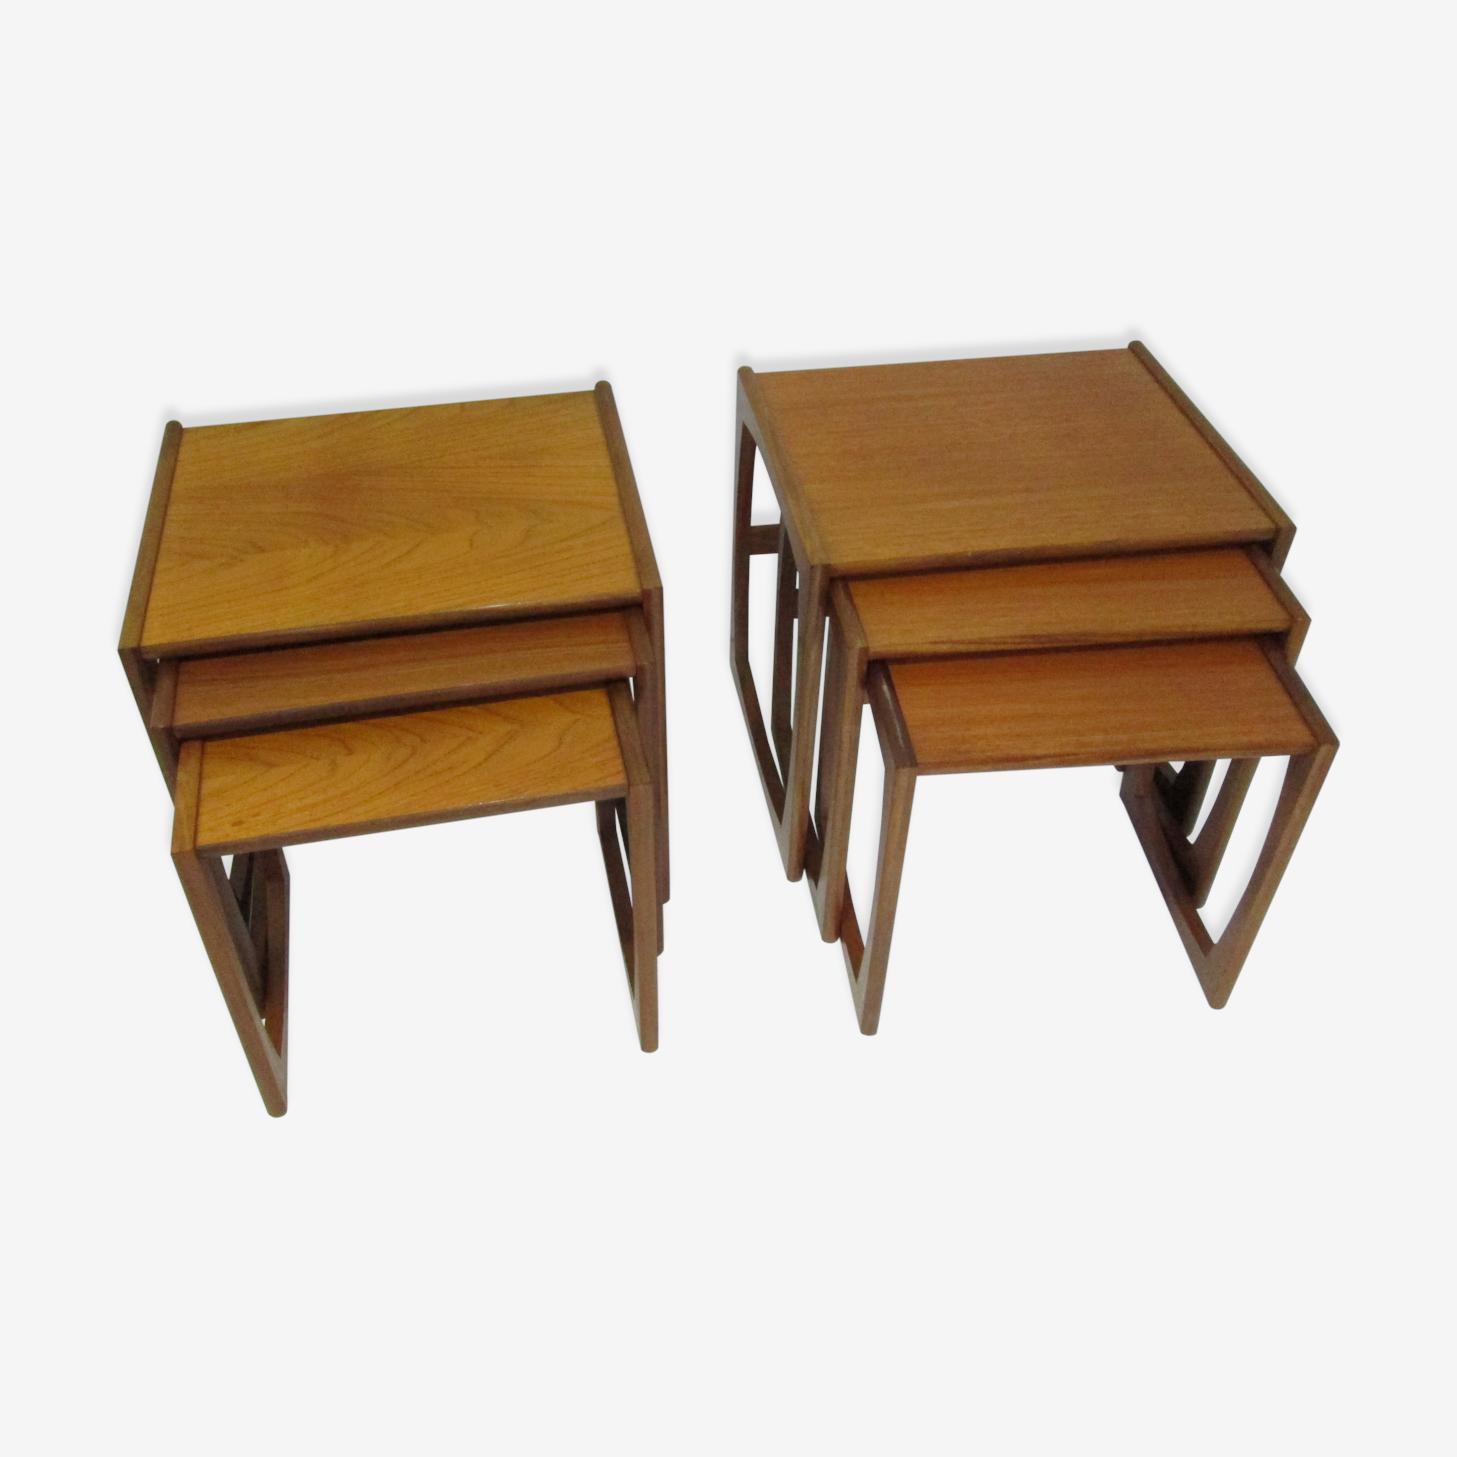 Paire de tables gigognes en teck vintage